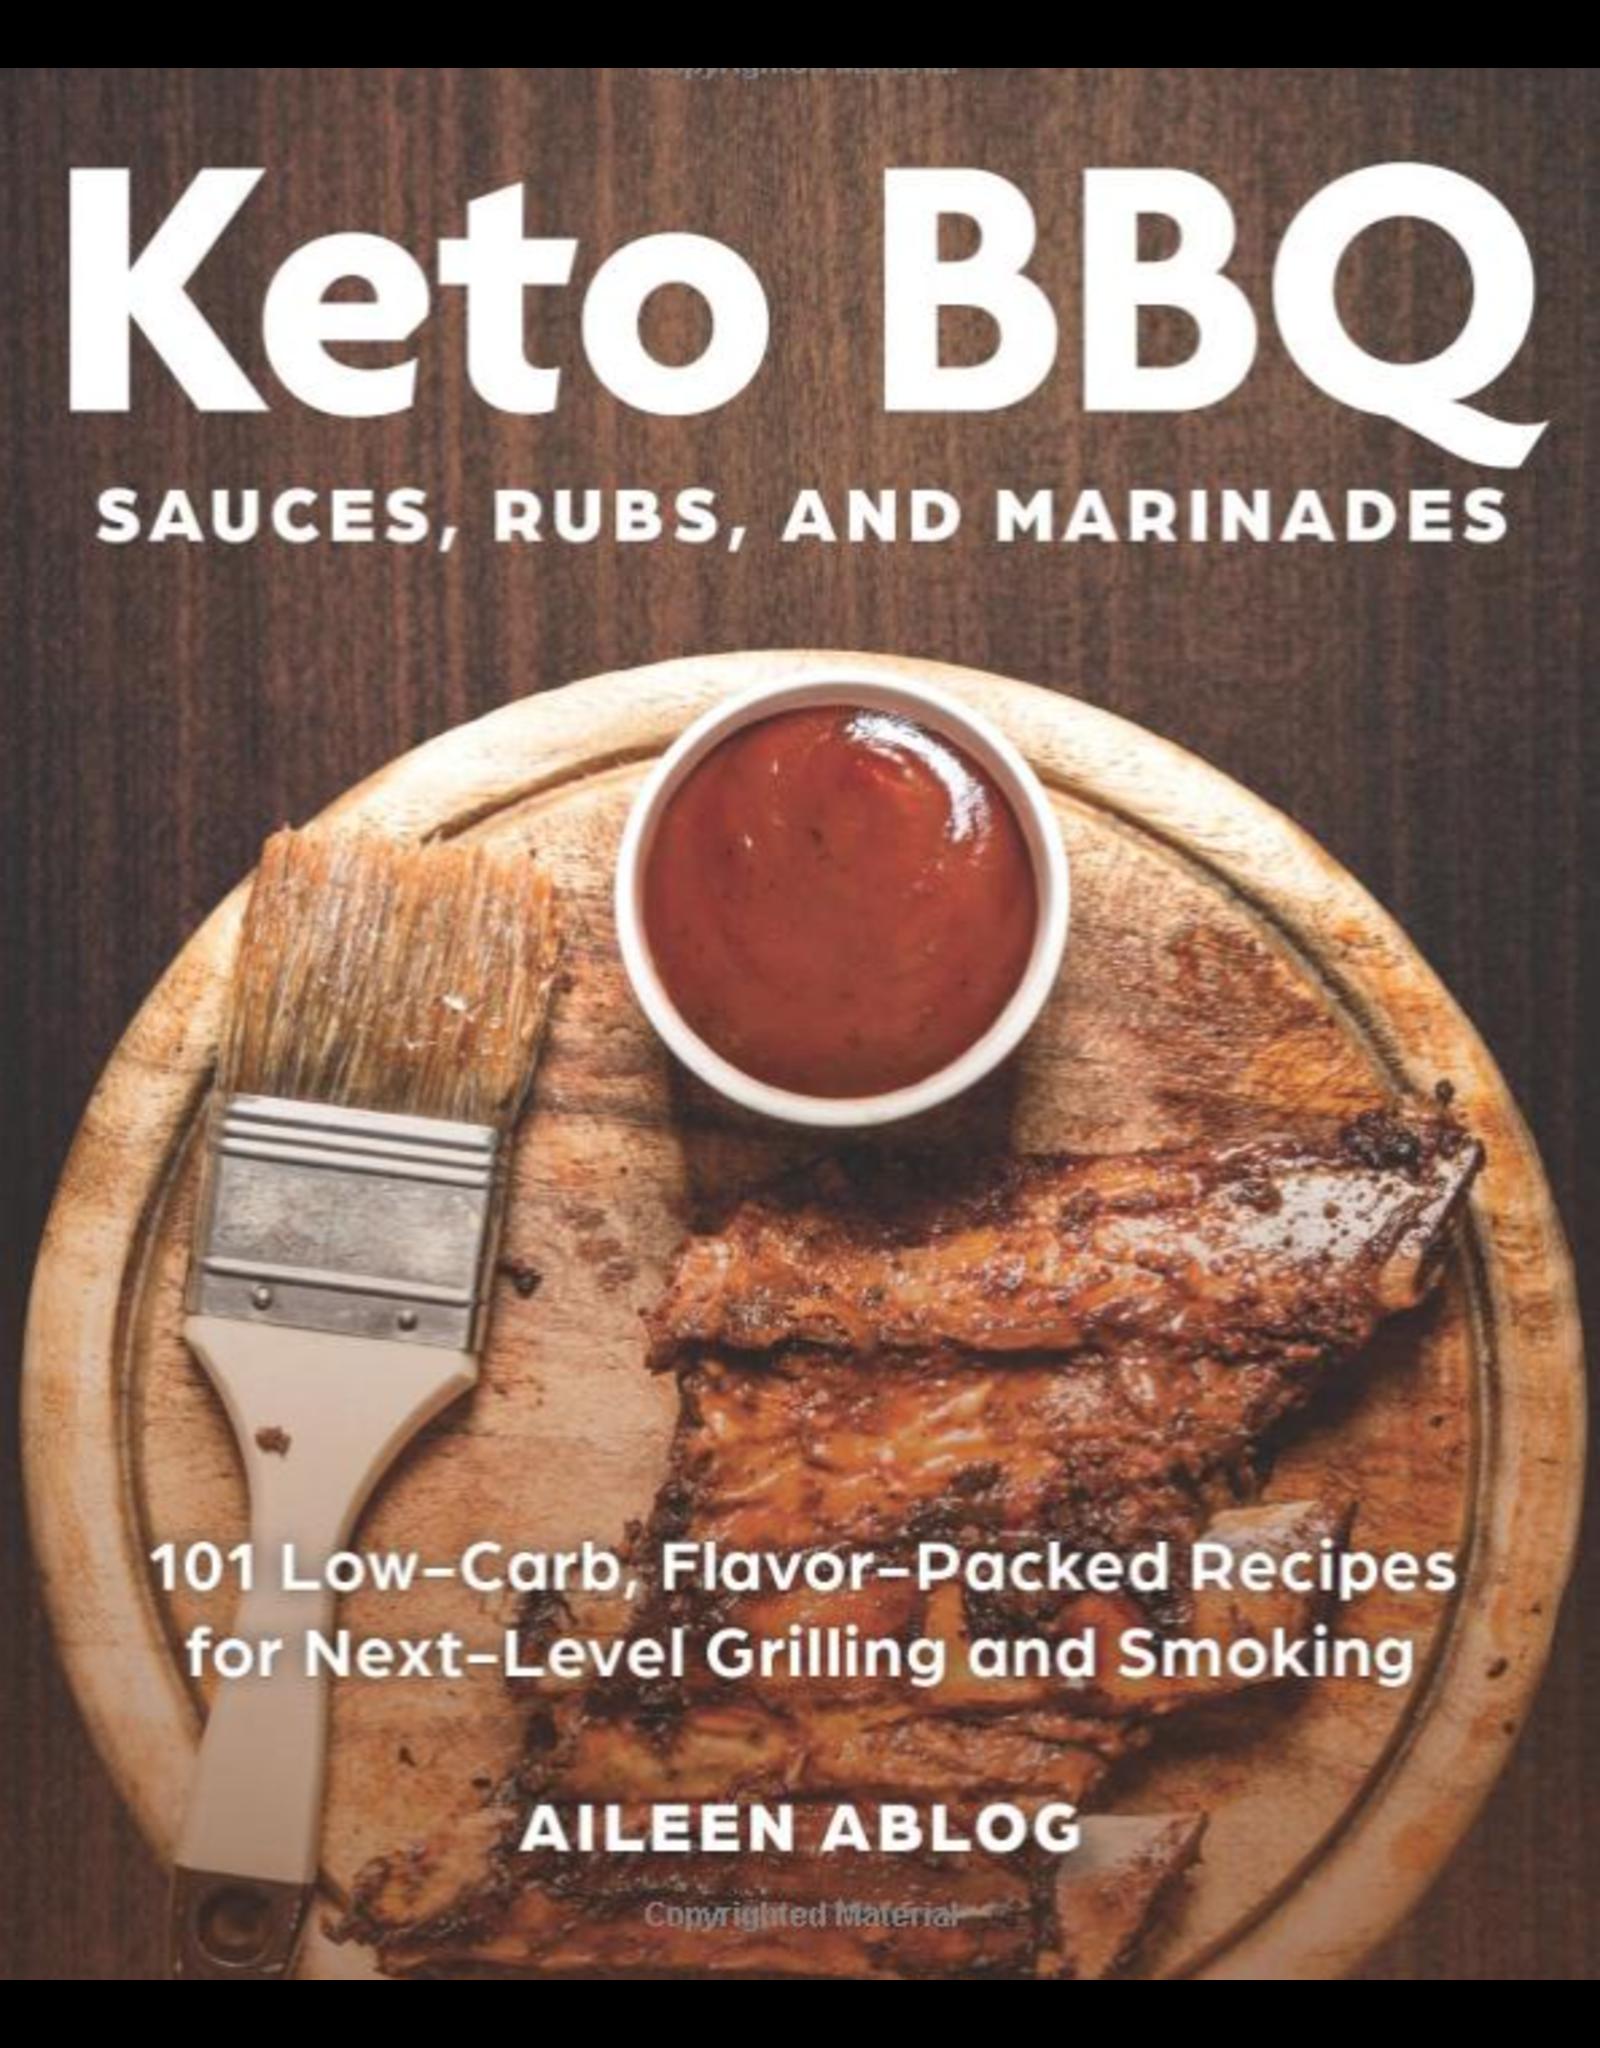 Hachette Keto BBQ - Sauces, Rubs, and Marinades